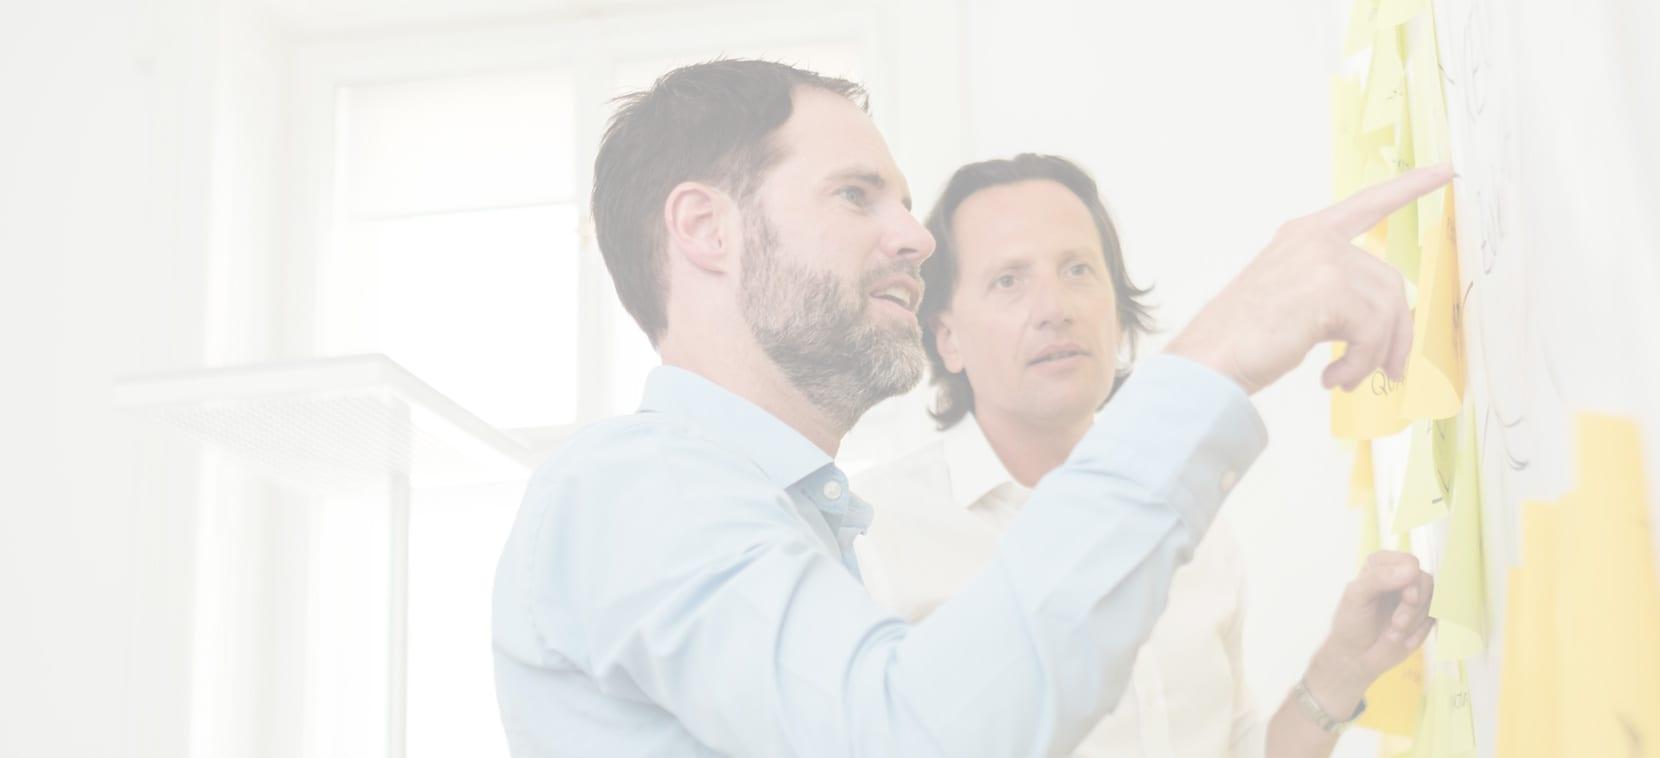 Markenberatung & Entwicklung, Seminare, Coaching - Andreas Powisch